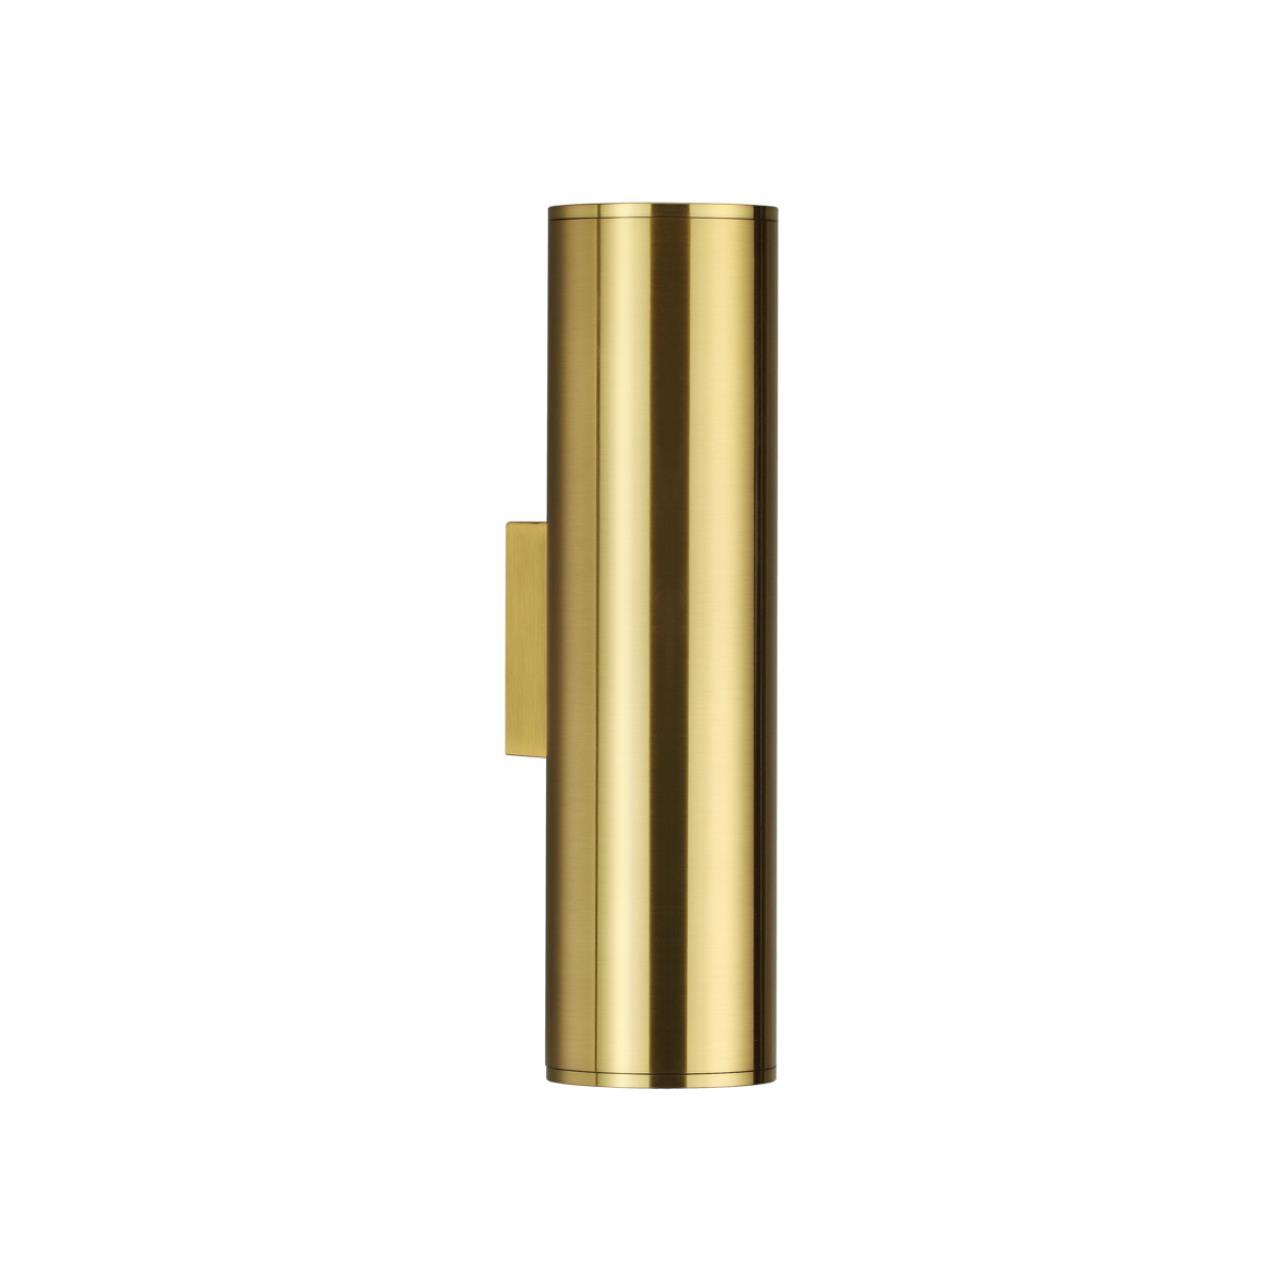 3833/2WB HIGHTECH ODL20 211 золотистый /металл Настенный светильник E27, LED 7W 220V DARIO